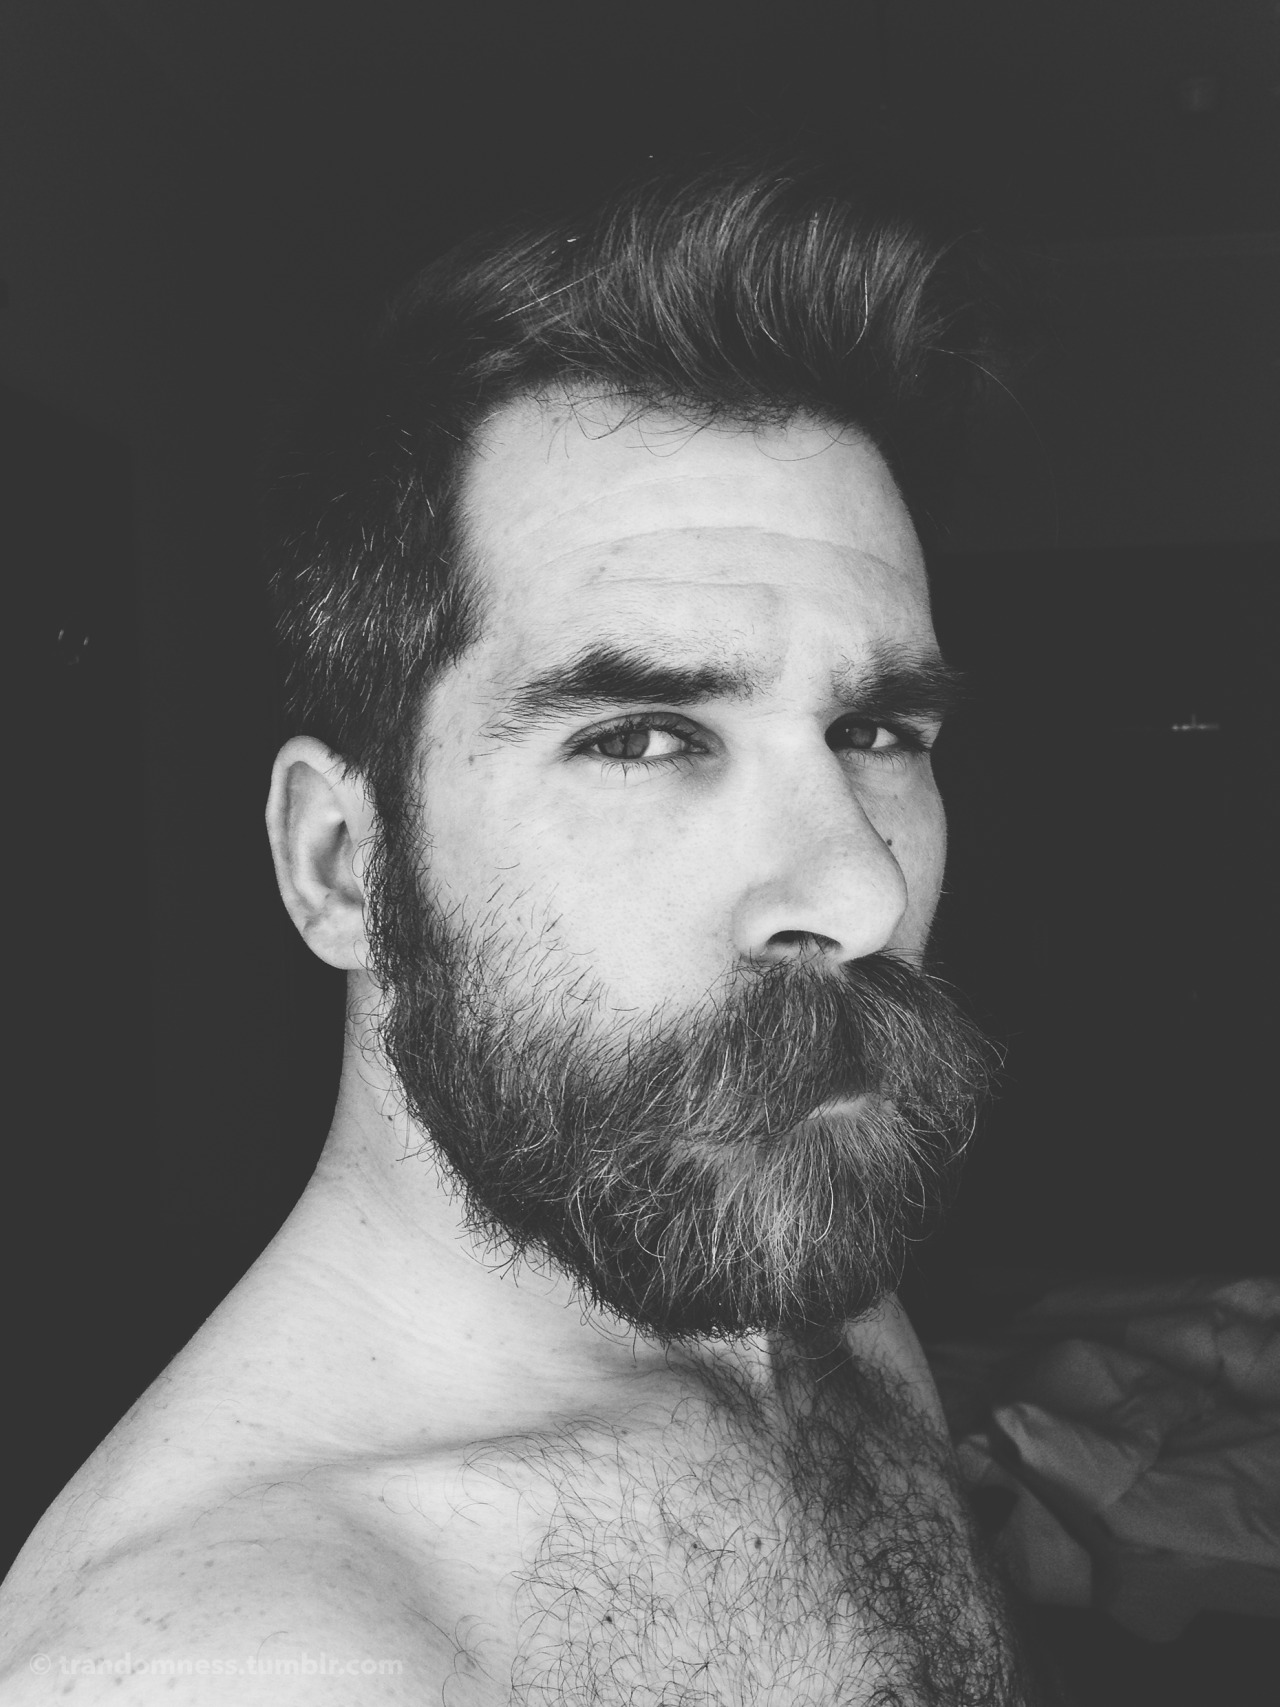 2018-06-04 05:21:36 - trandomness throwback thursday waking up by beardburnme http://www.neofic.com